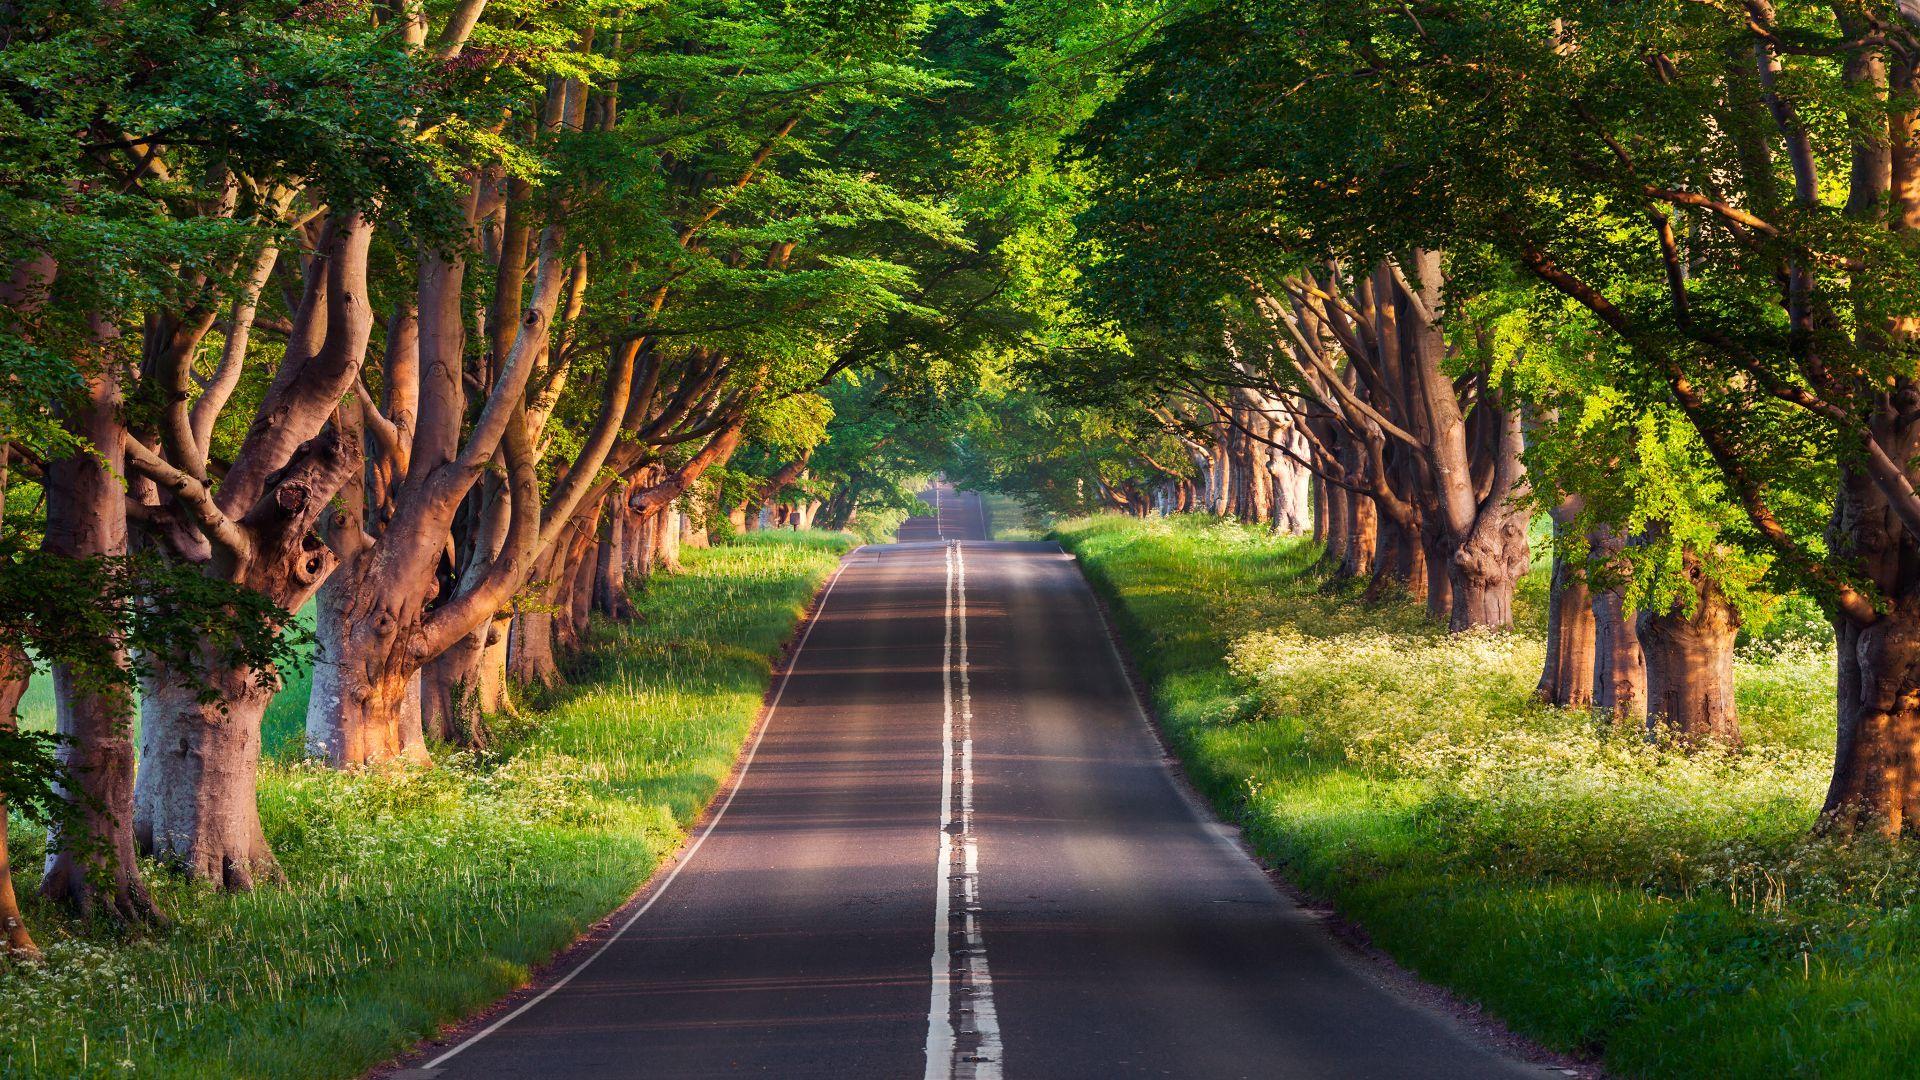 Road Trees Summer 4k Horizontal Paisaje De Fantasia Fondos